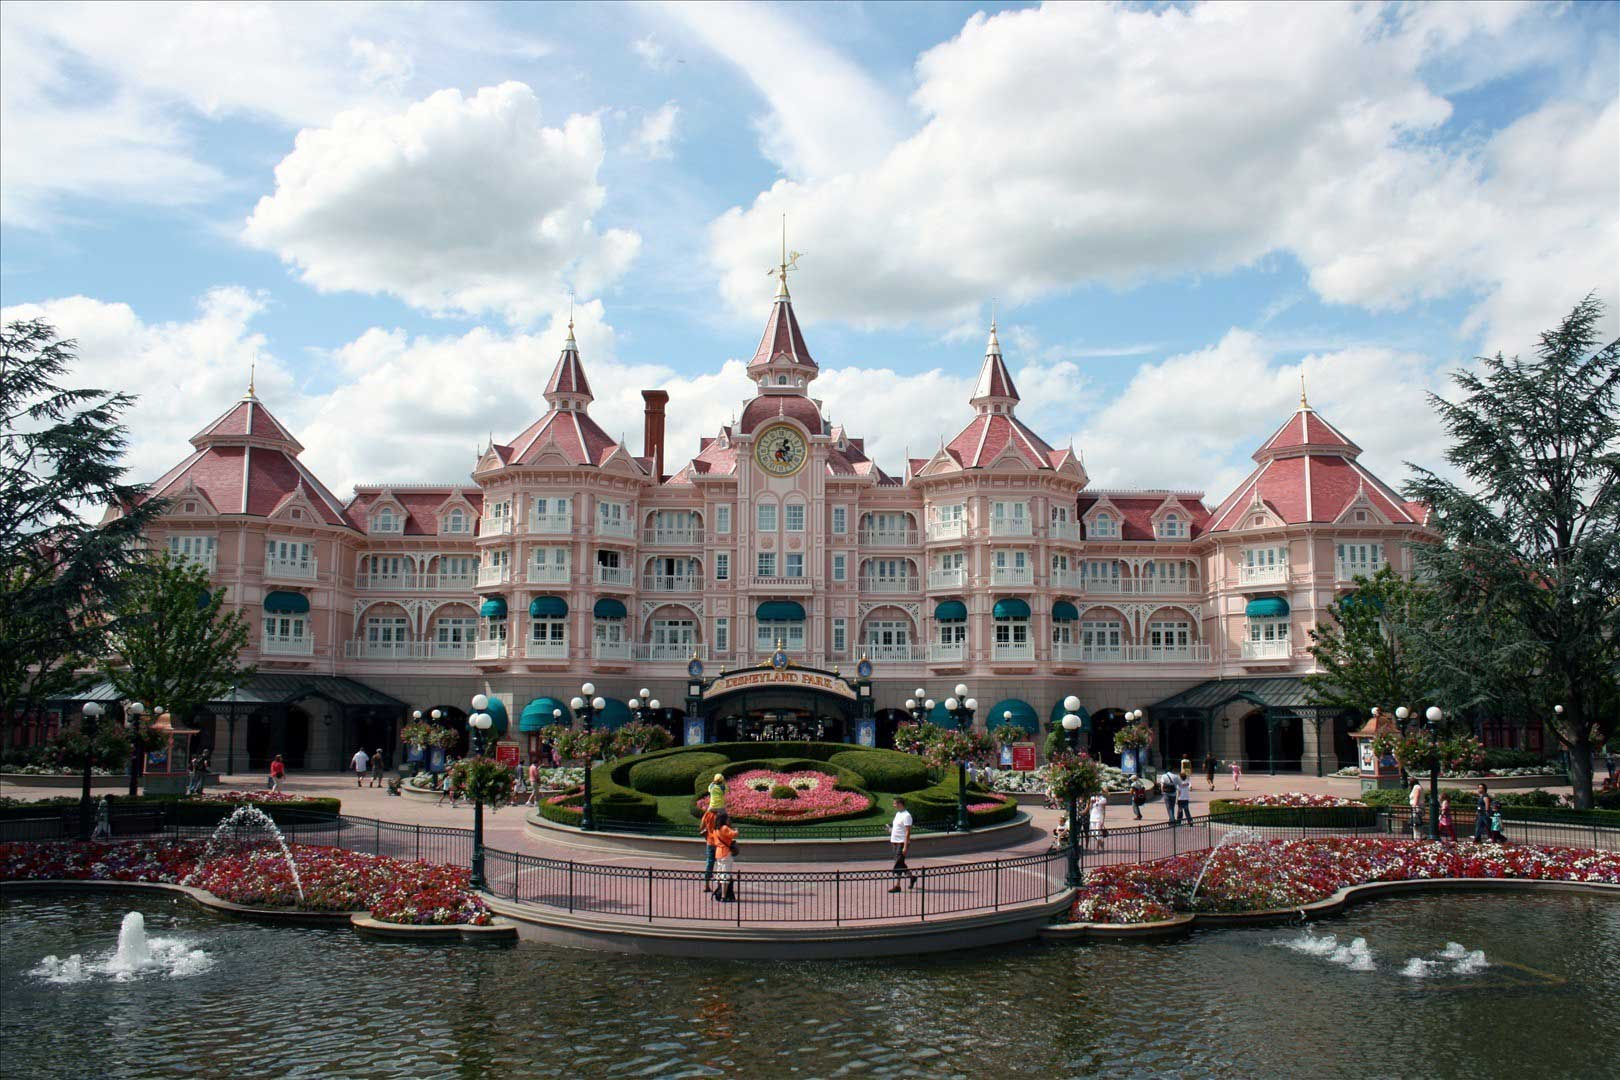 Hotel Pas Cher Proche Disneyland Paris